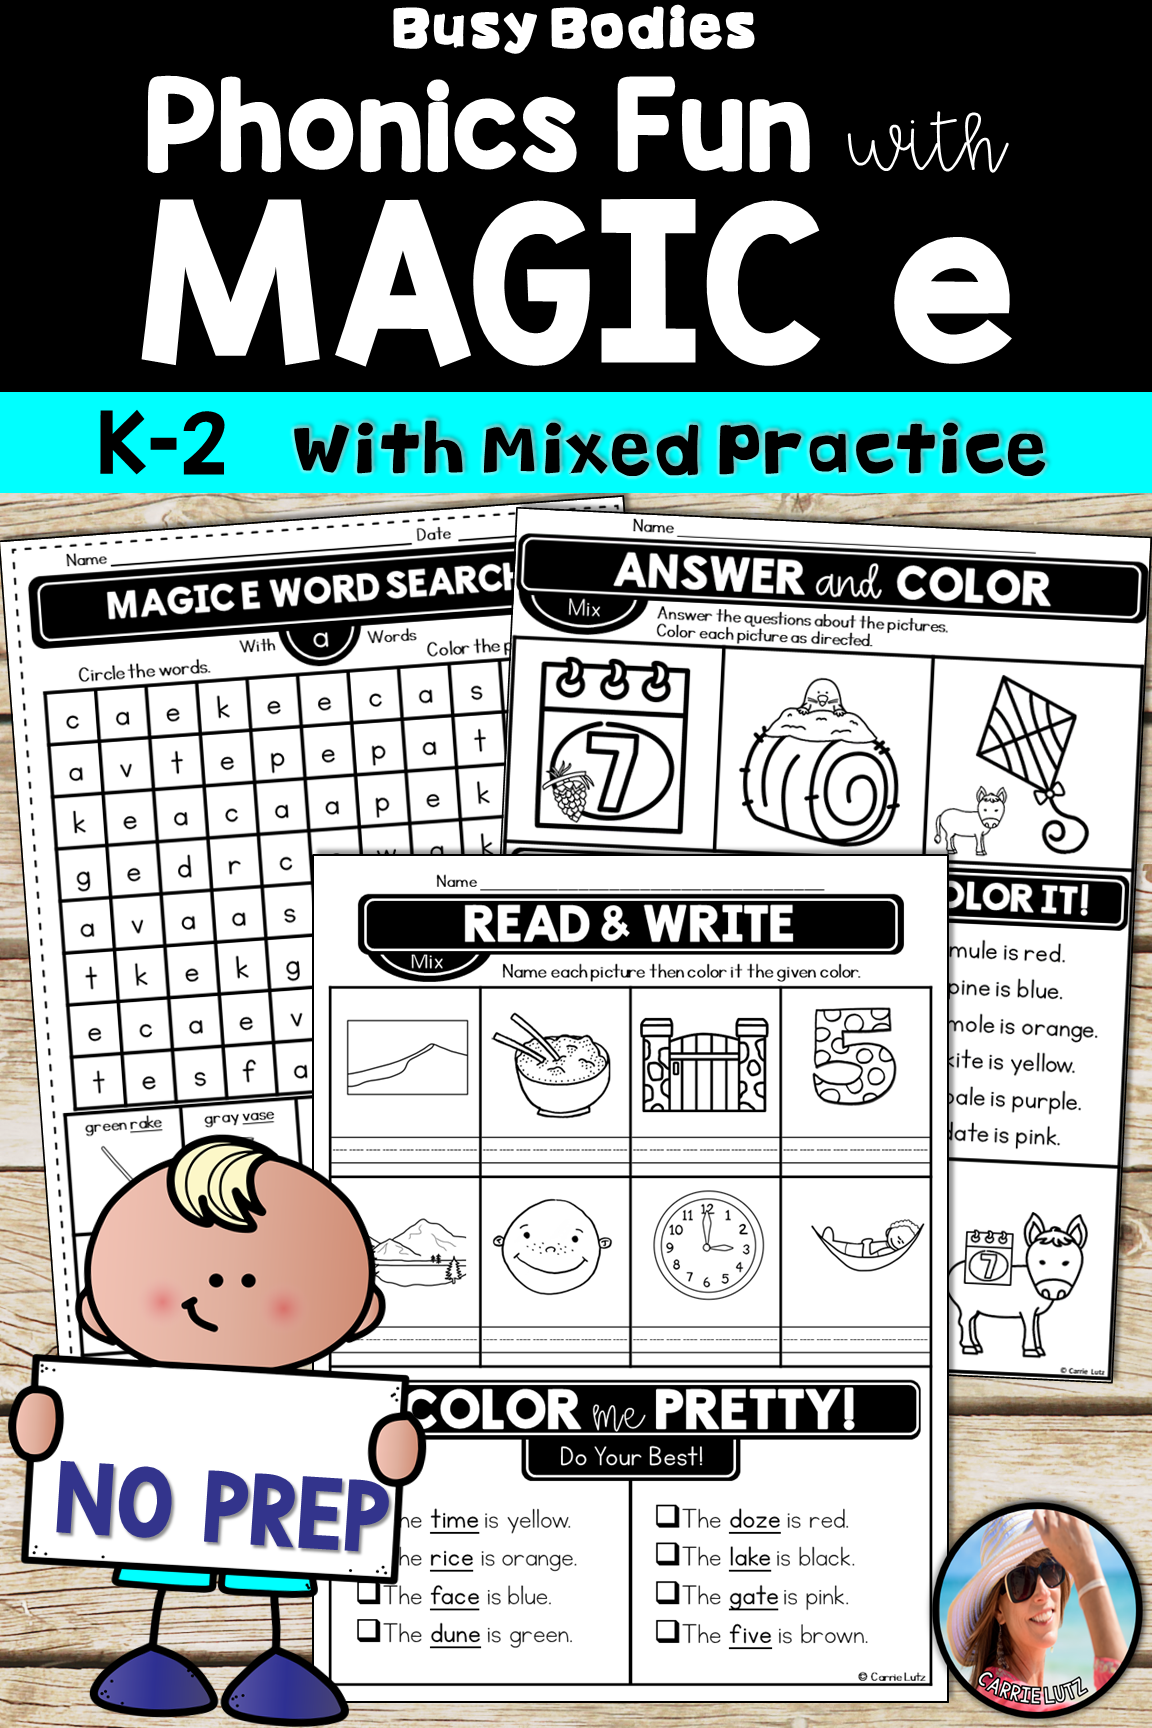 small resolution of Phonics Magic E Worksheets K-2   Magic e